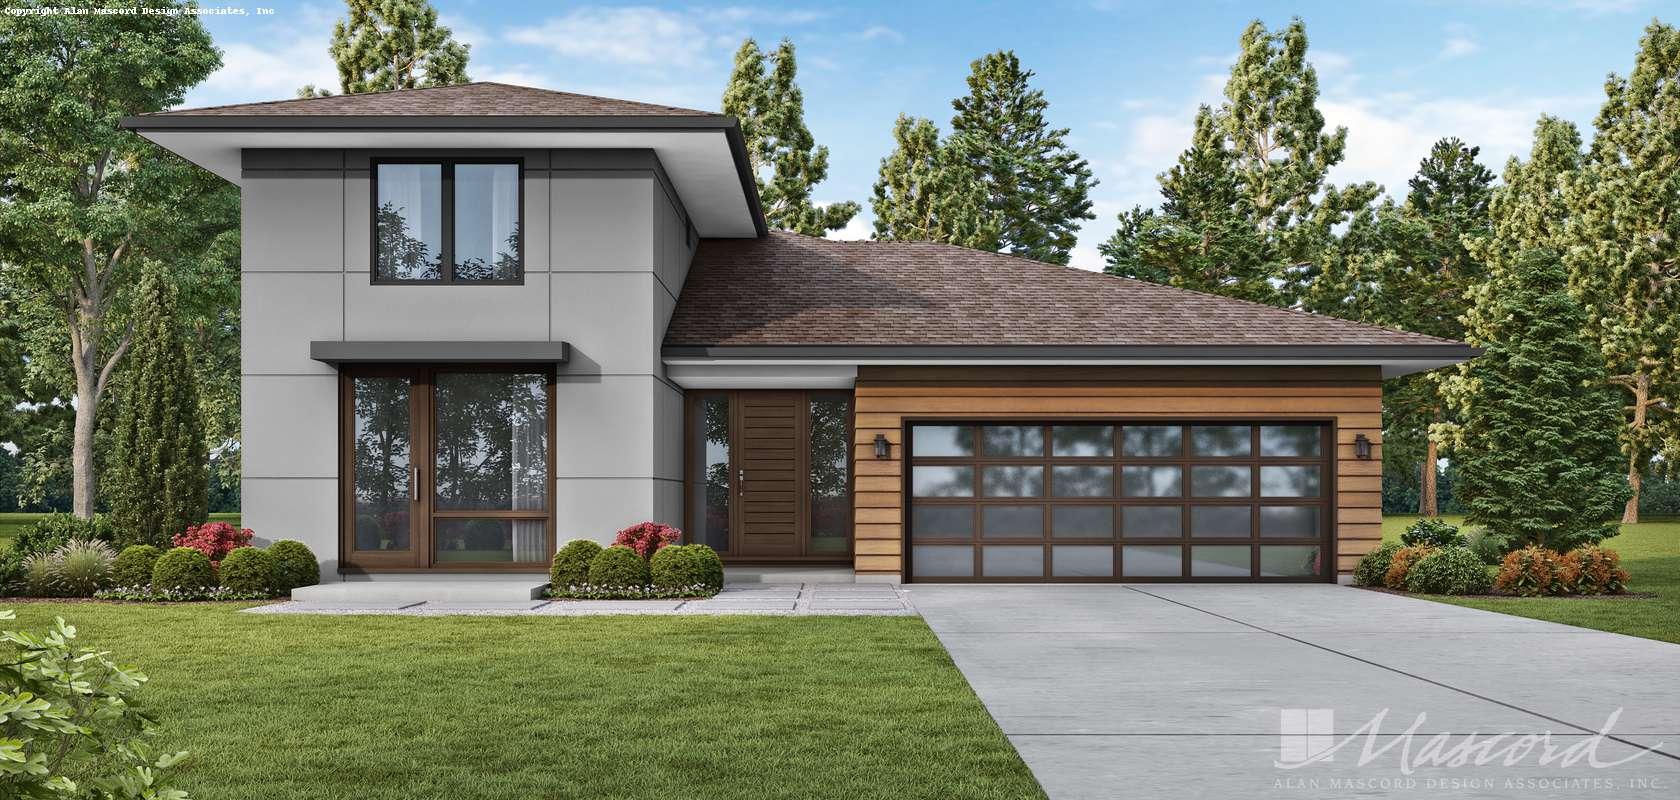 Mascord House Plan 1260A: The Alameda South